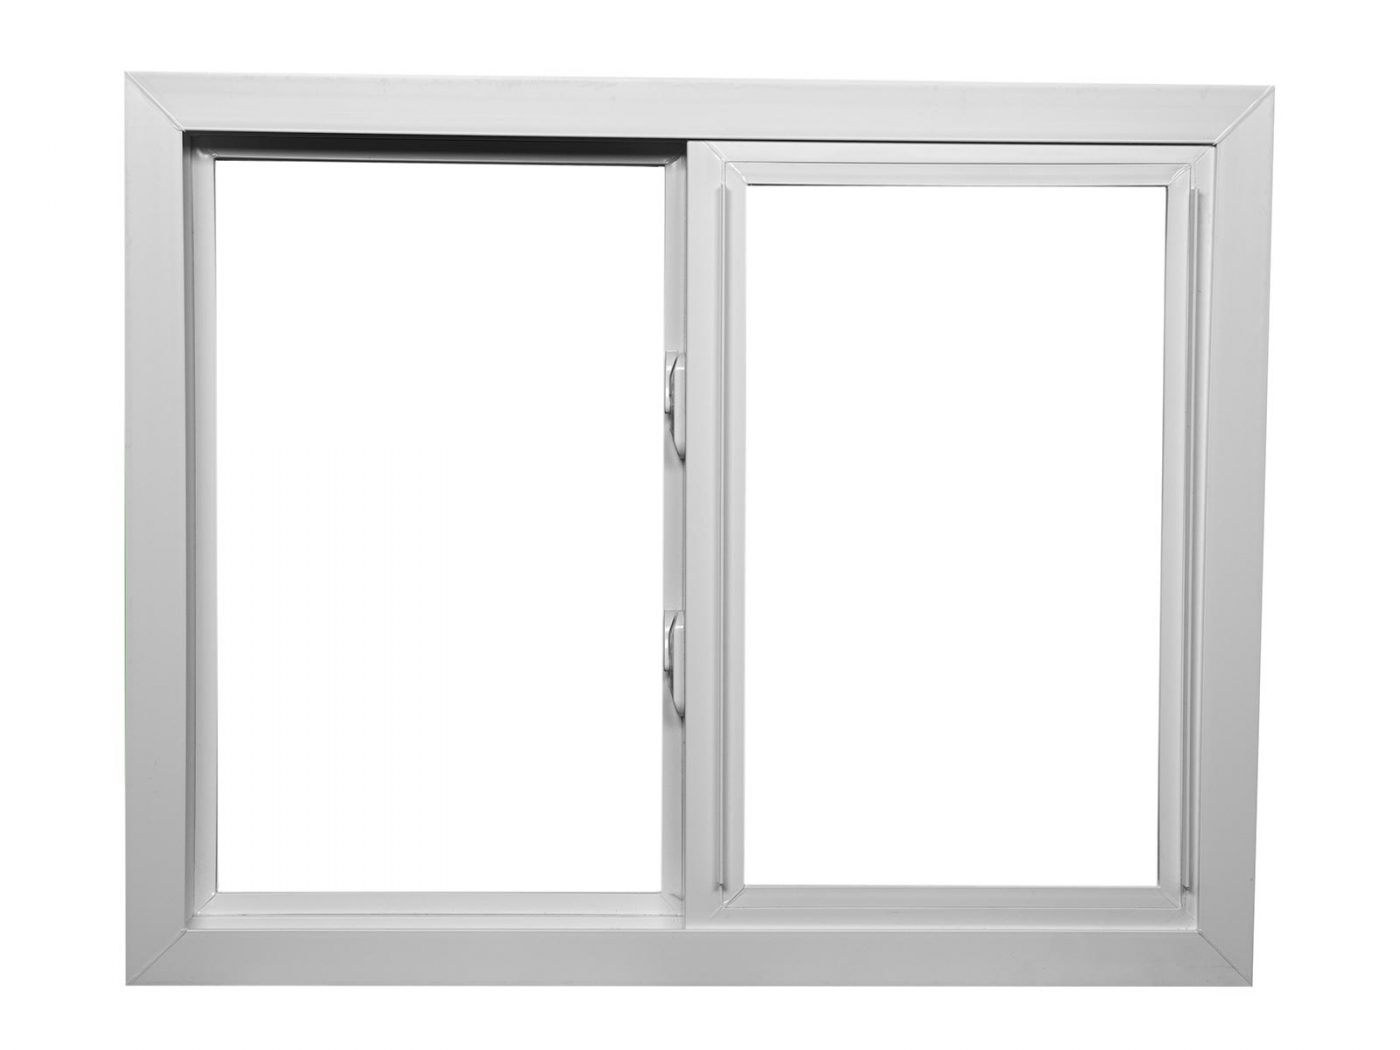 seattle wa Signature series vinyl replacement window installation